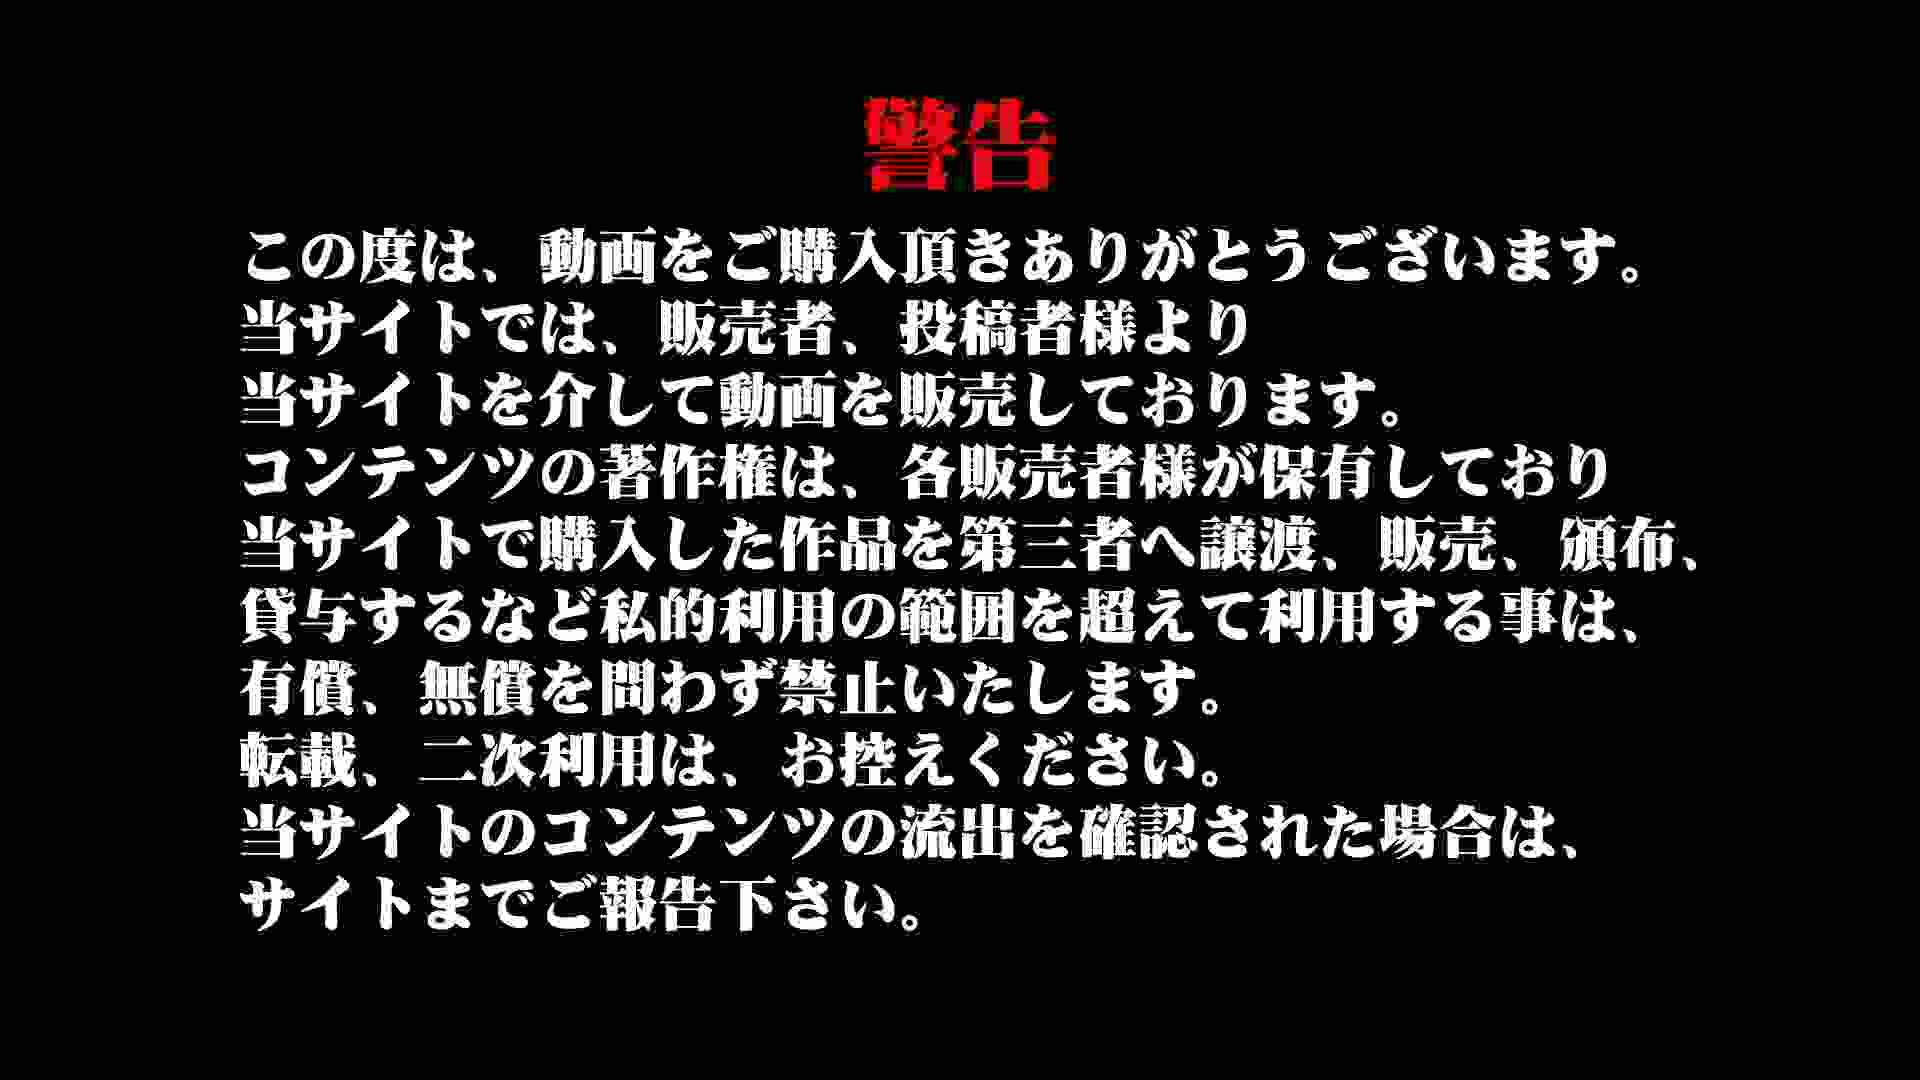 Aquaな露天風呂Vol.962 OLのエロ生活 | 露天風呂  35連発 1